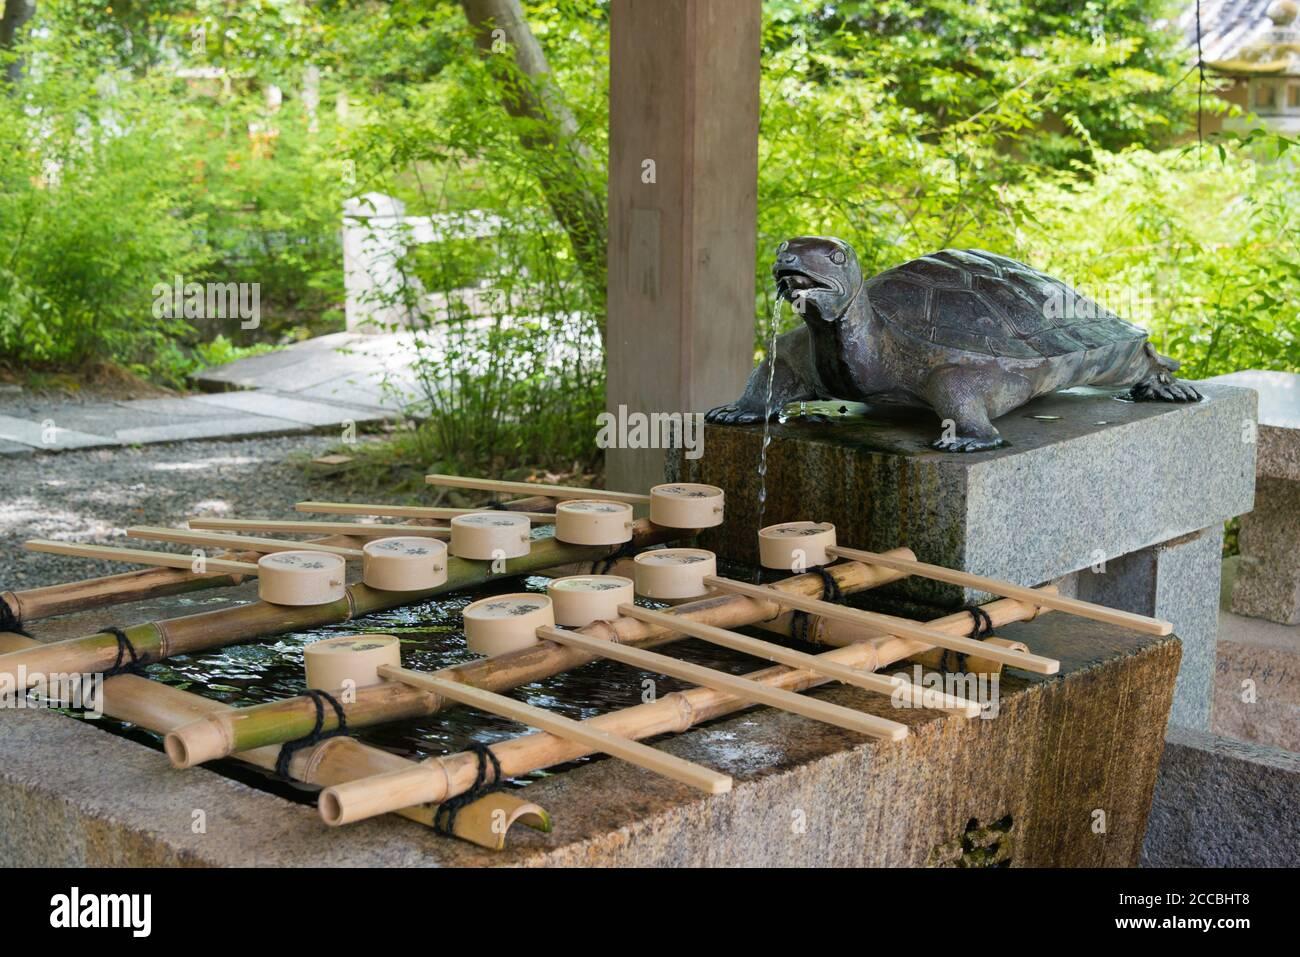 Kyoto, Japan - Matsunoo-taisha Shrine in Kyoto, Japan. it's said Matsuno'o Taisha was founded in 701. Stock Photo